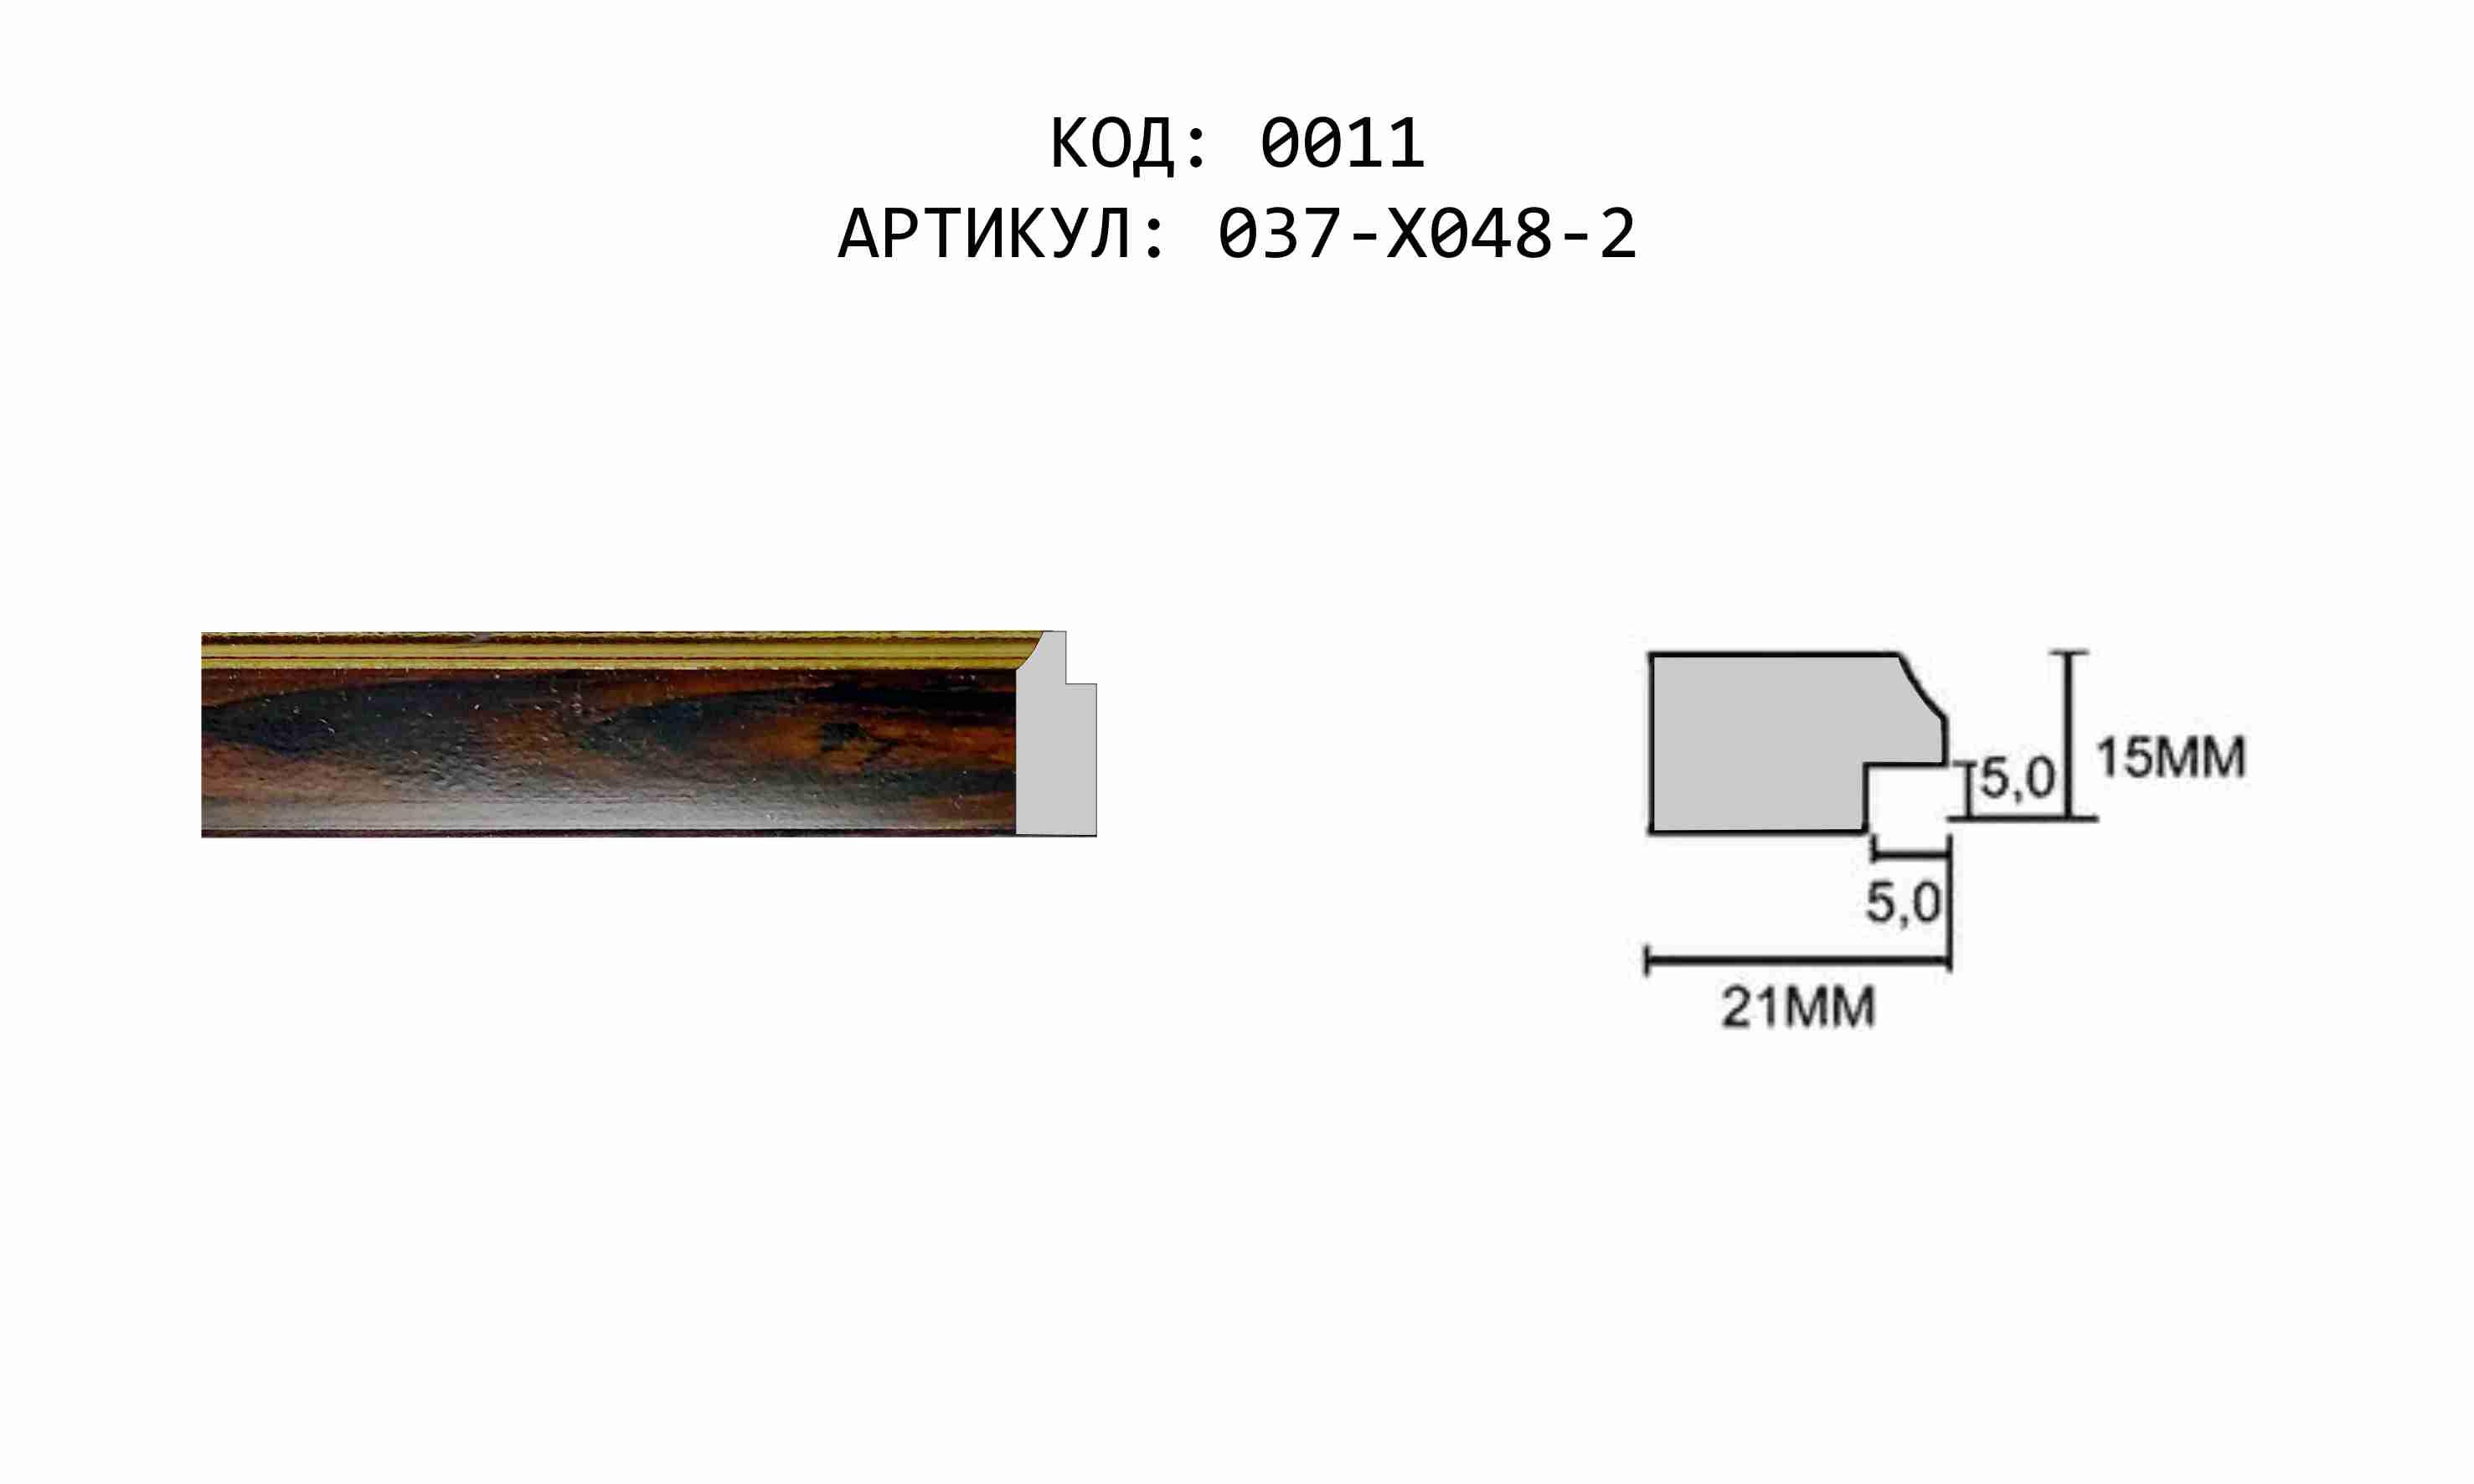 Артикул: 037-X048-2